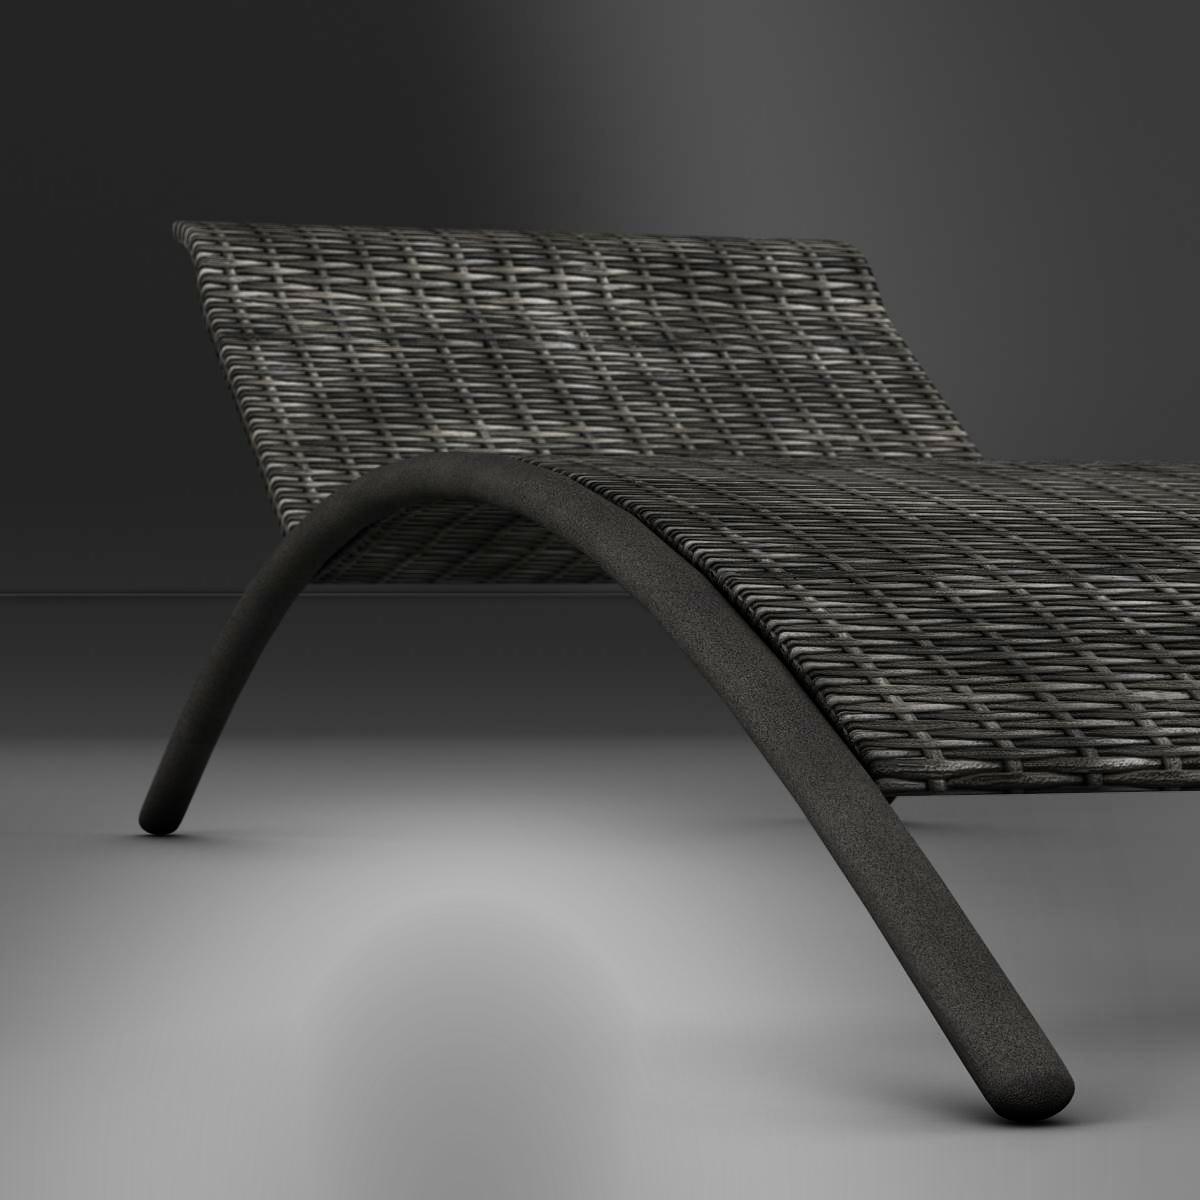 sunbed chair 3d model 3ds max fbx c4d ma mb obj 162645